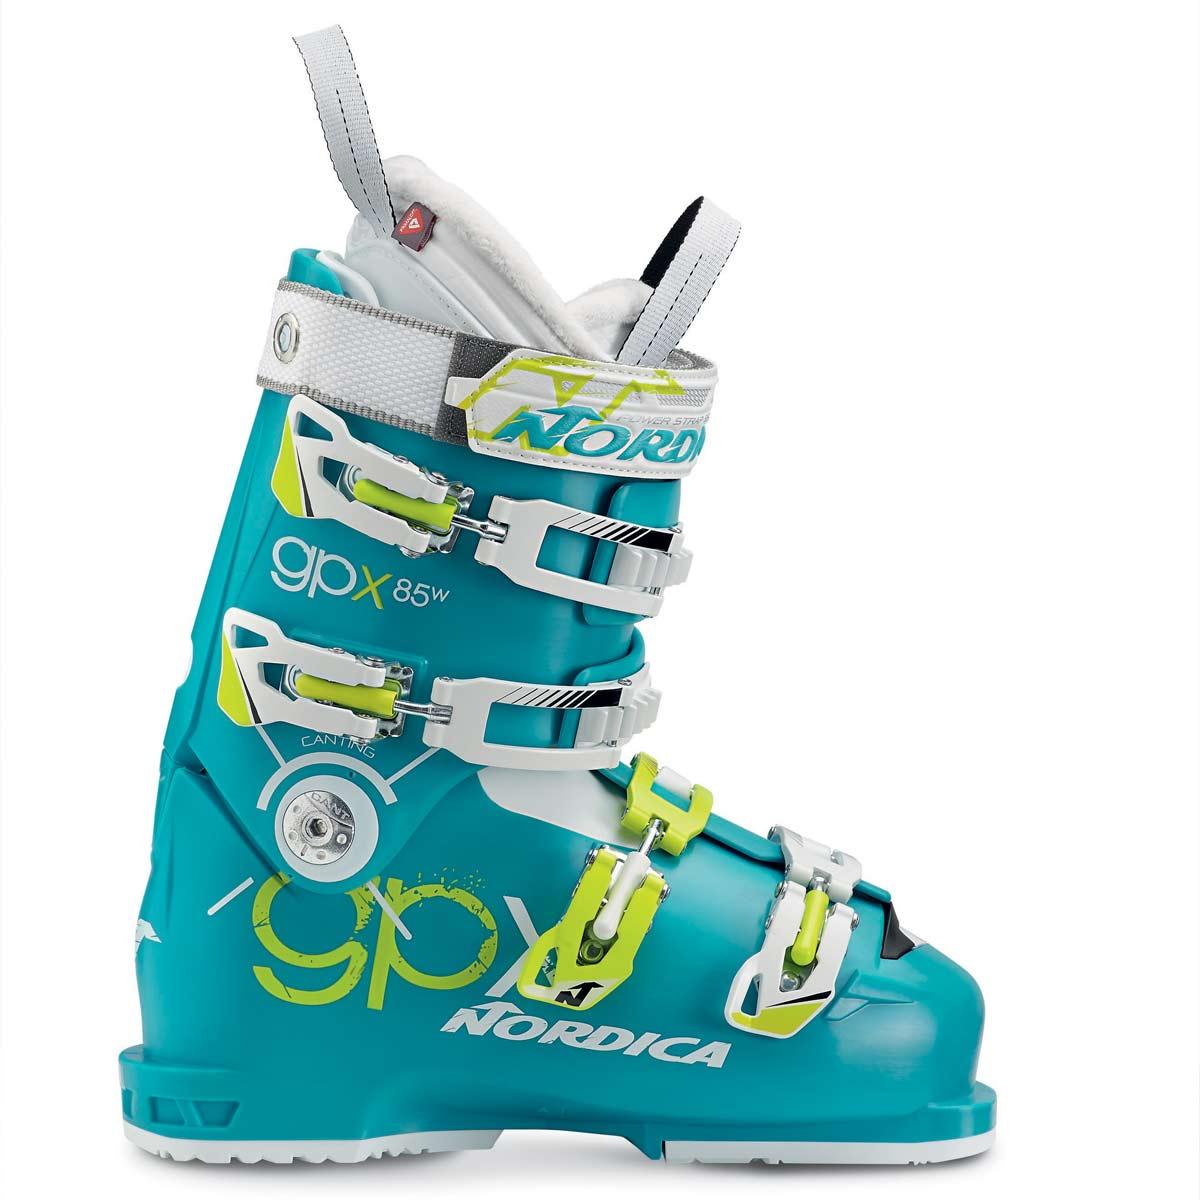 Nordica Gpx 85 W Ski Boots On Sale Powder7 Ski Shop